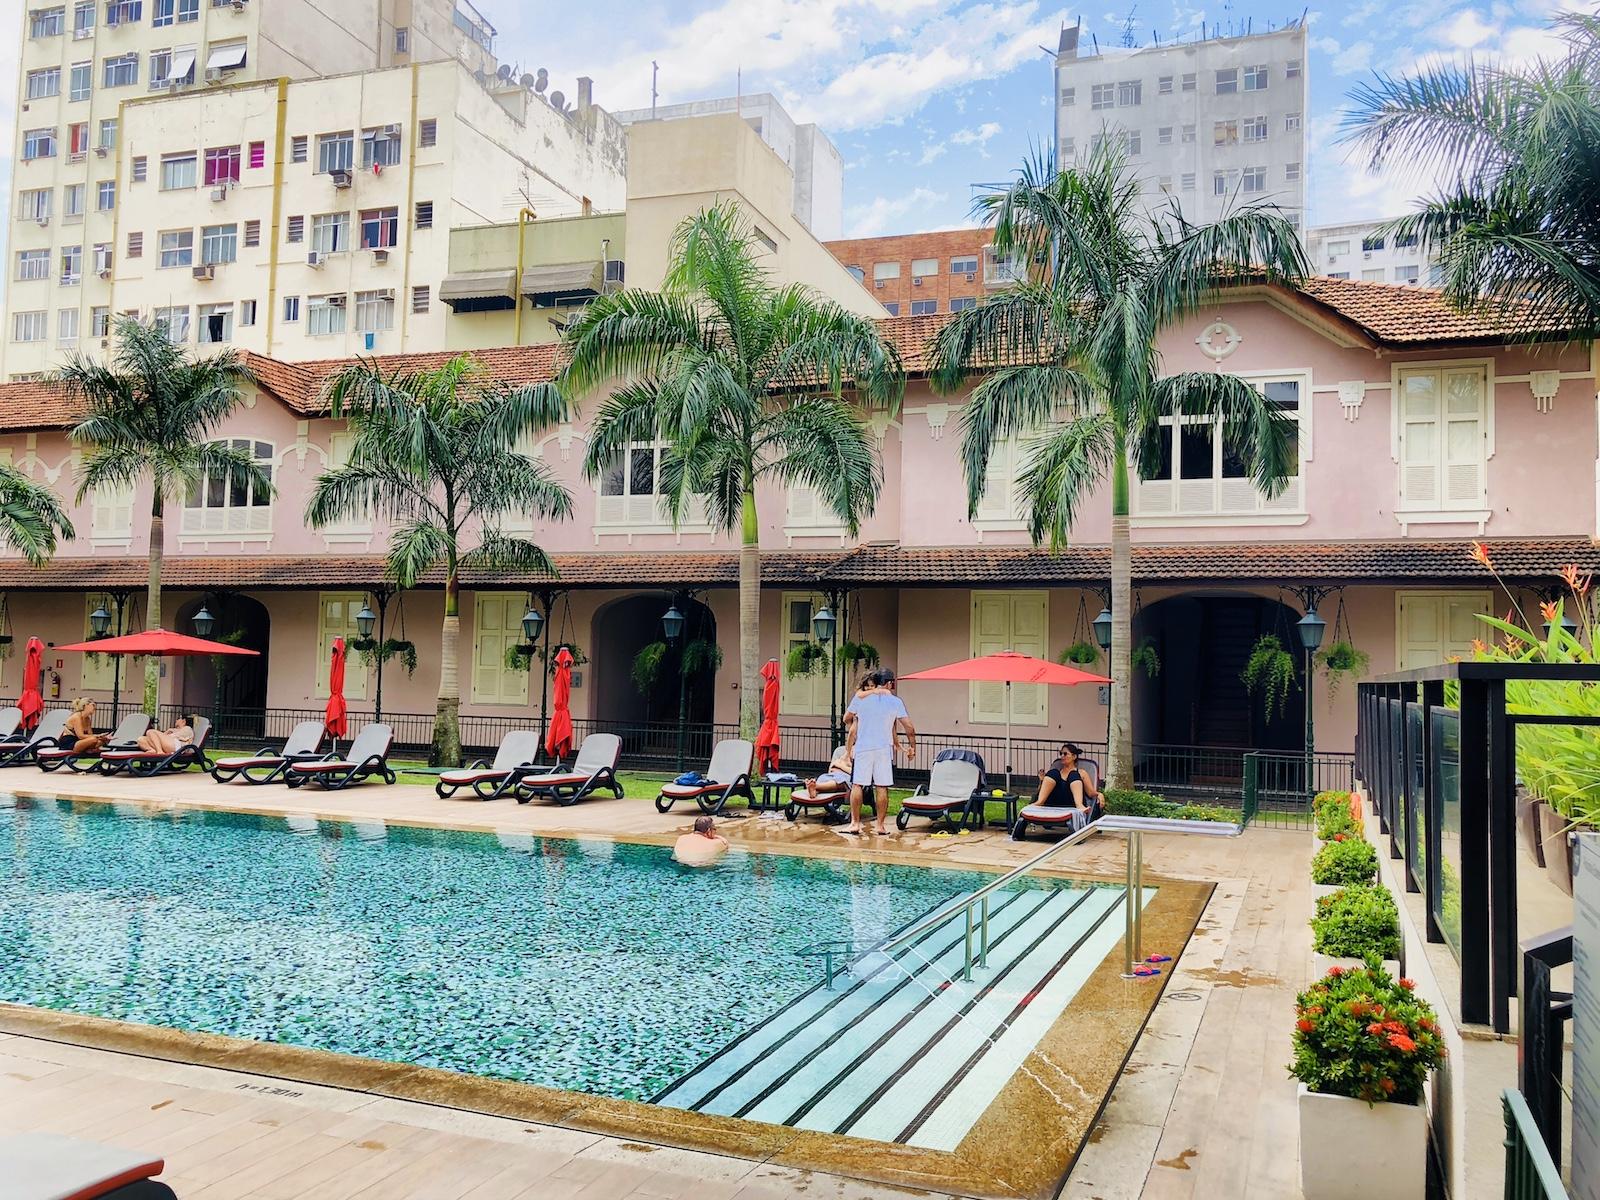 Unser schöner Pool im Hotel Vila Gale in Rio